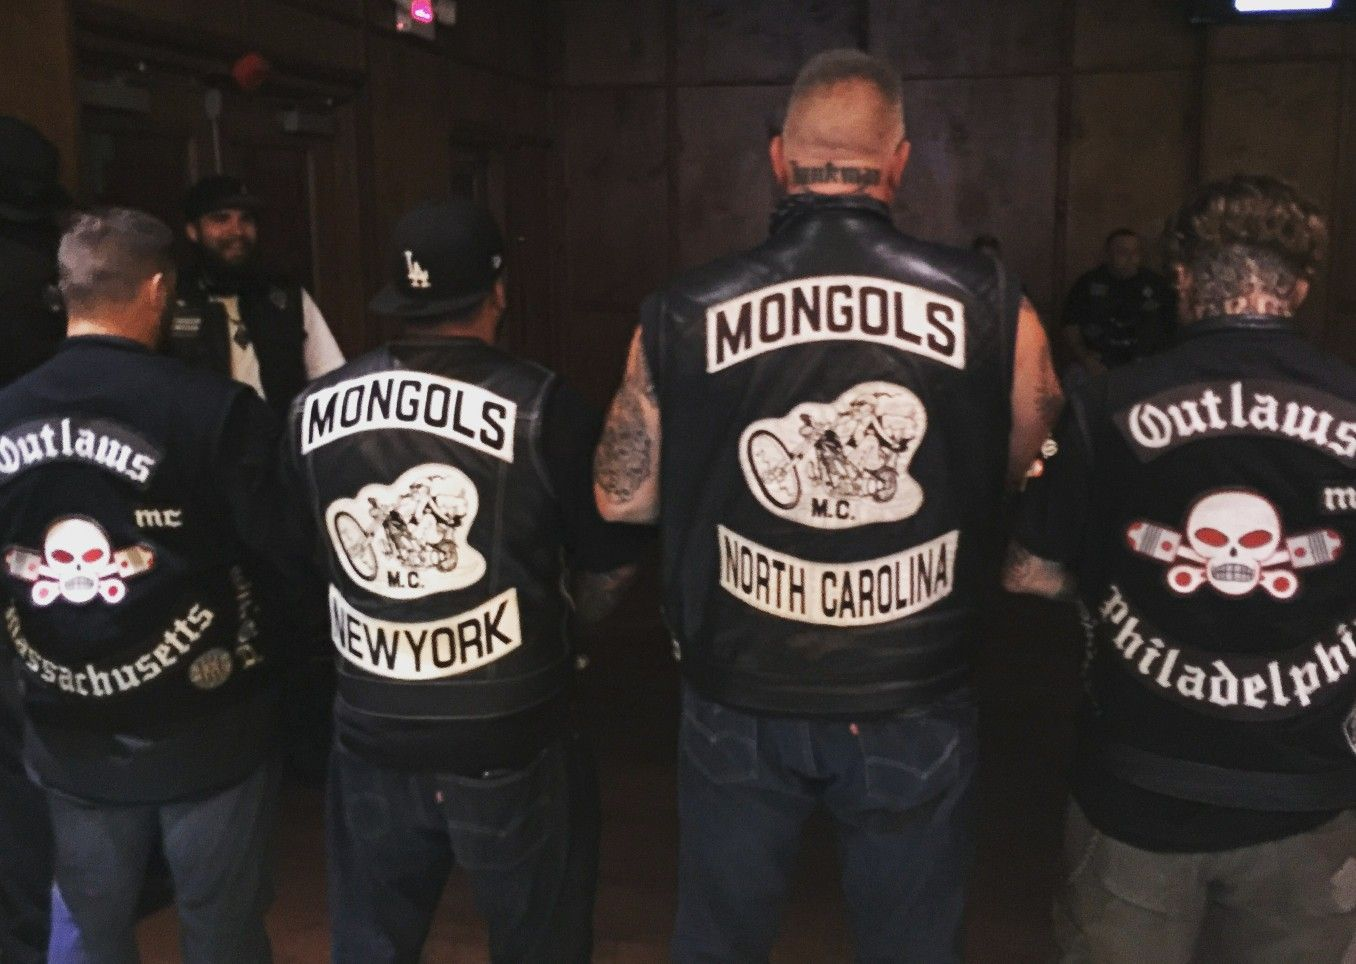 Mongols Mc And Outlaws Junkman